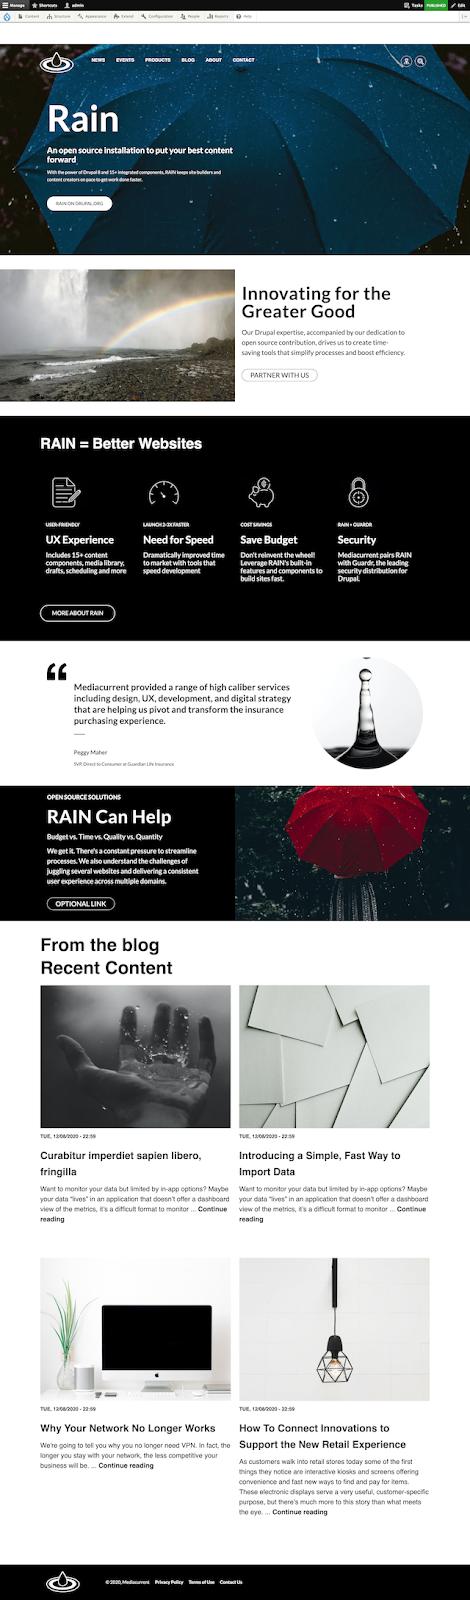 Homepage design for Mediacurrent's Rain CMS for Drupal 9 Nimbus theme